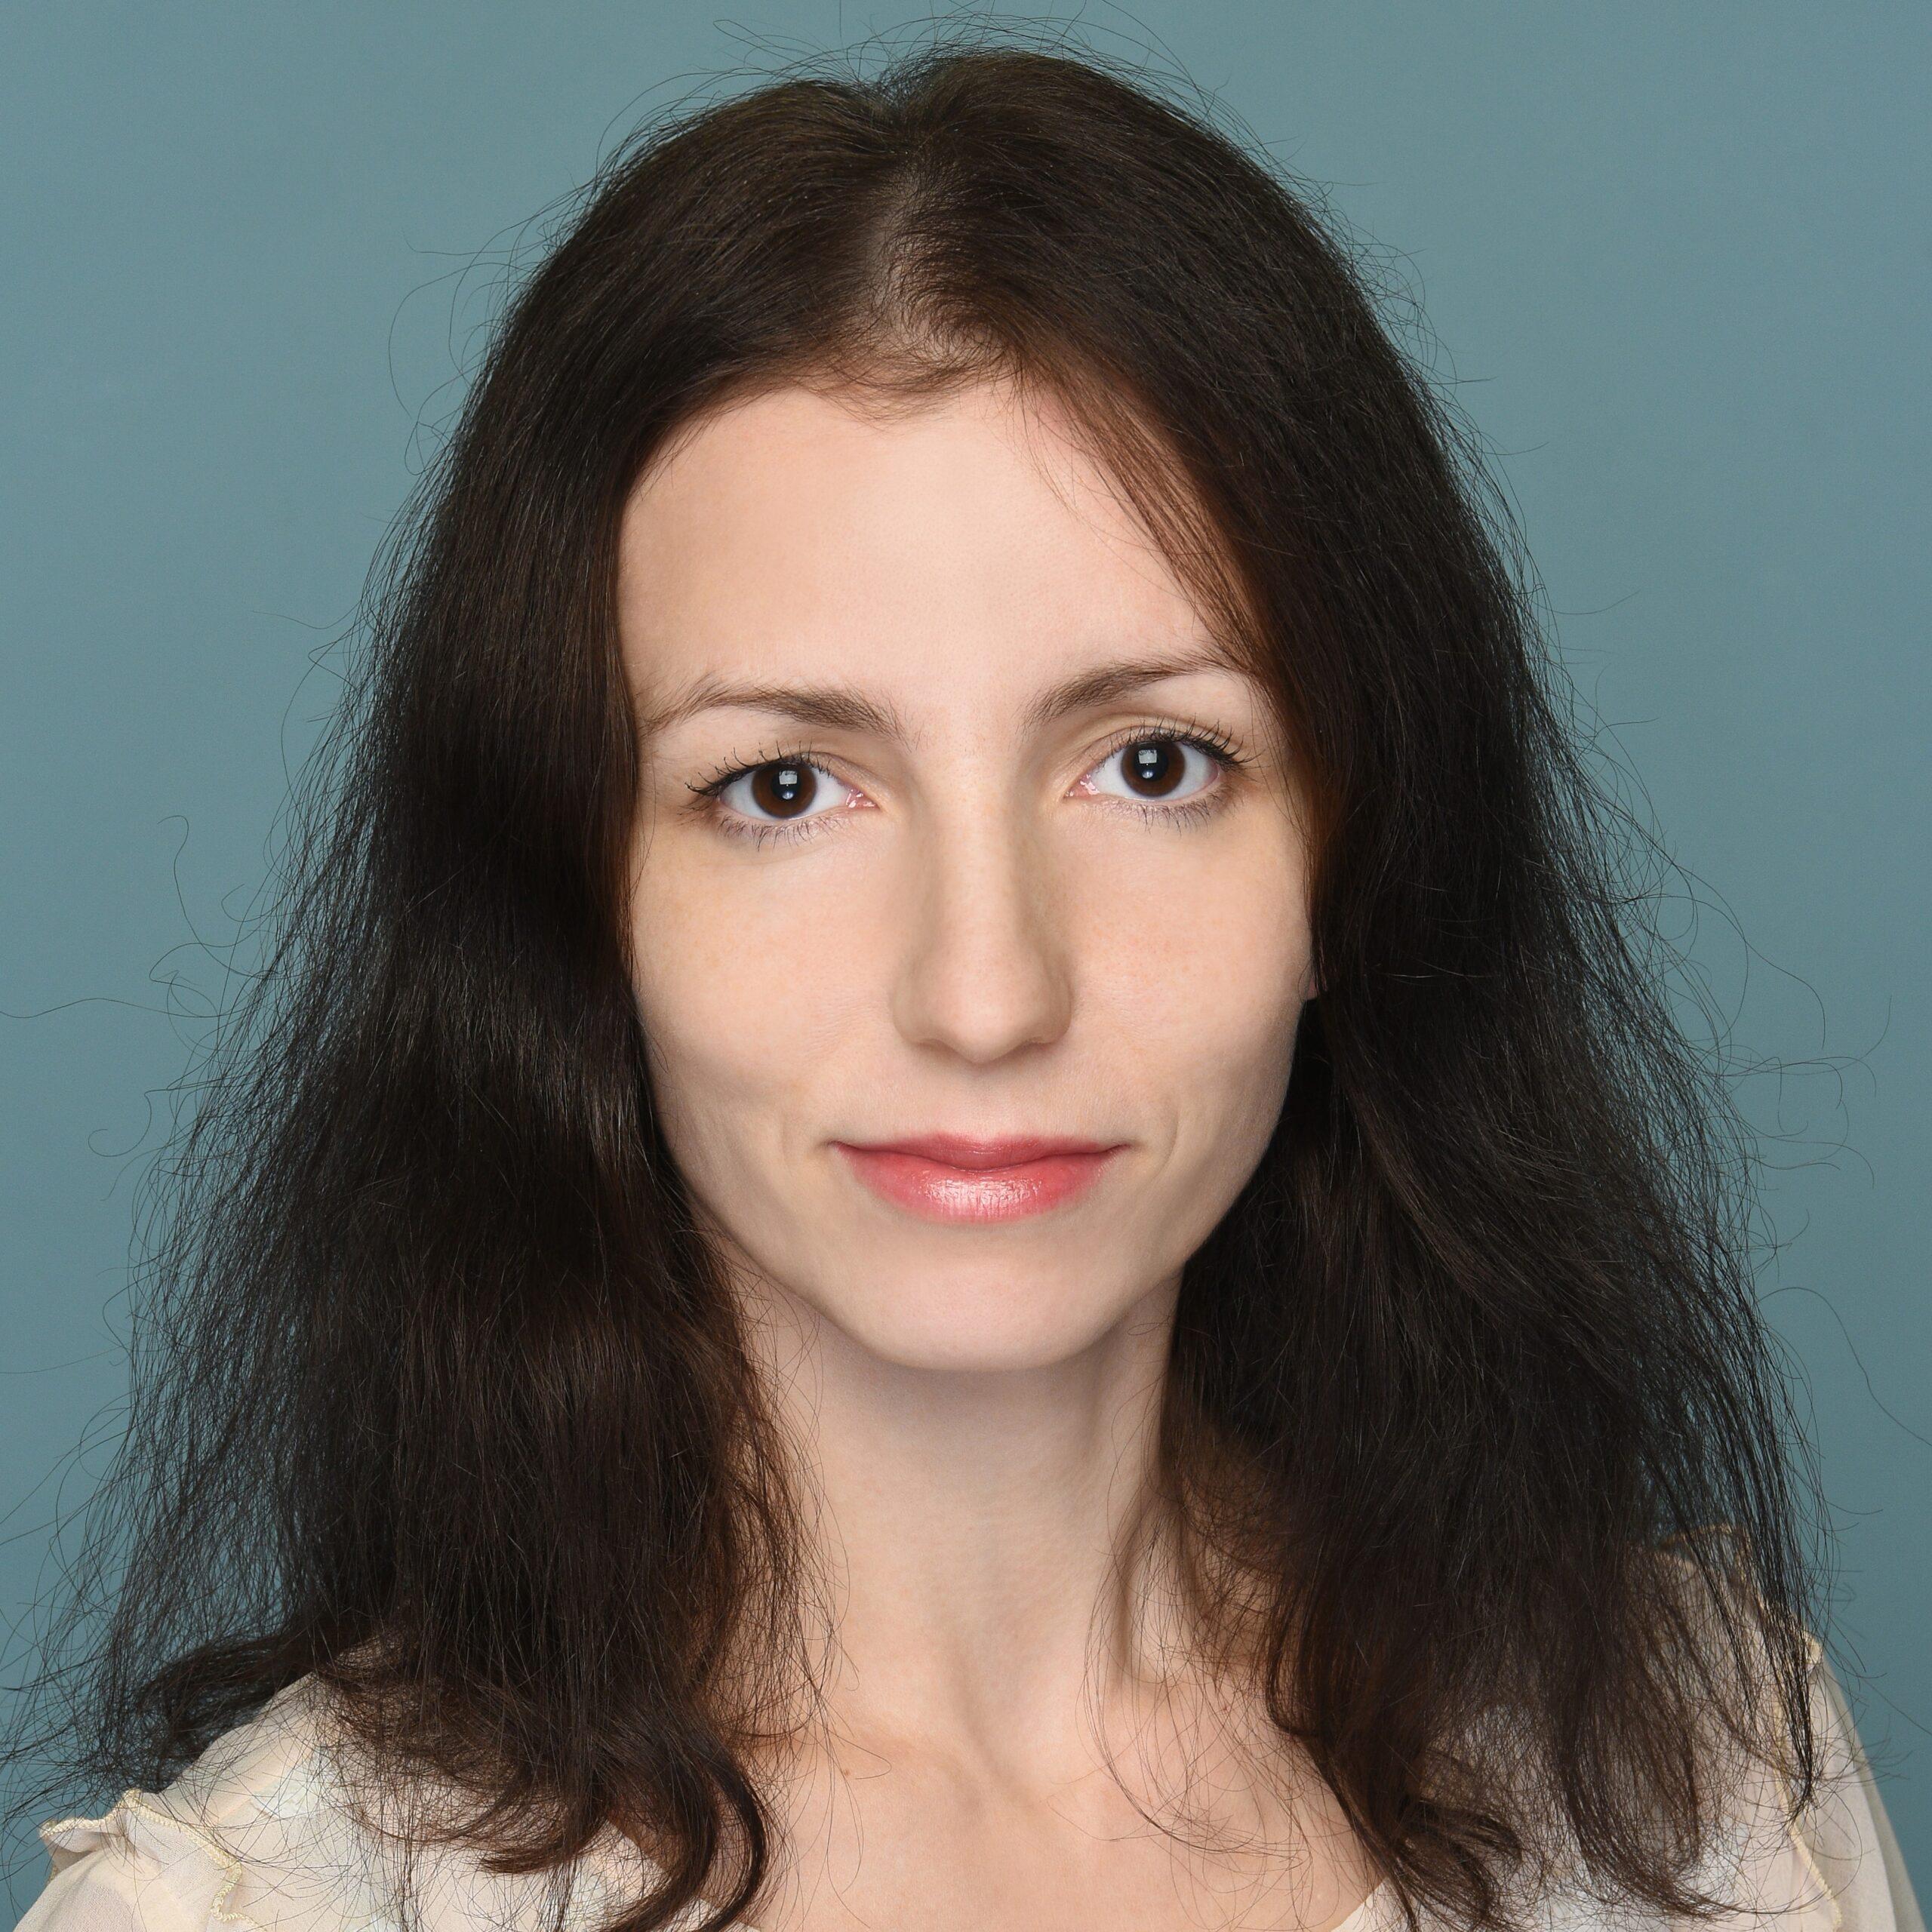 Наталия Валерьевна Сивакова